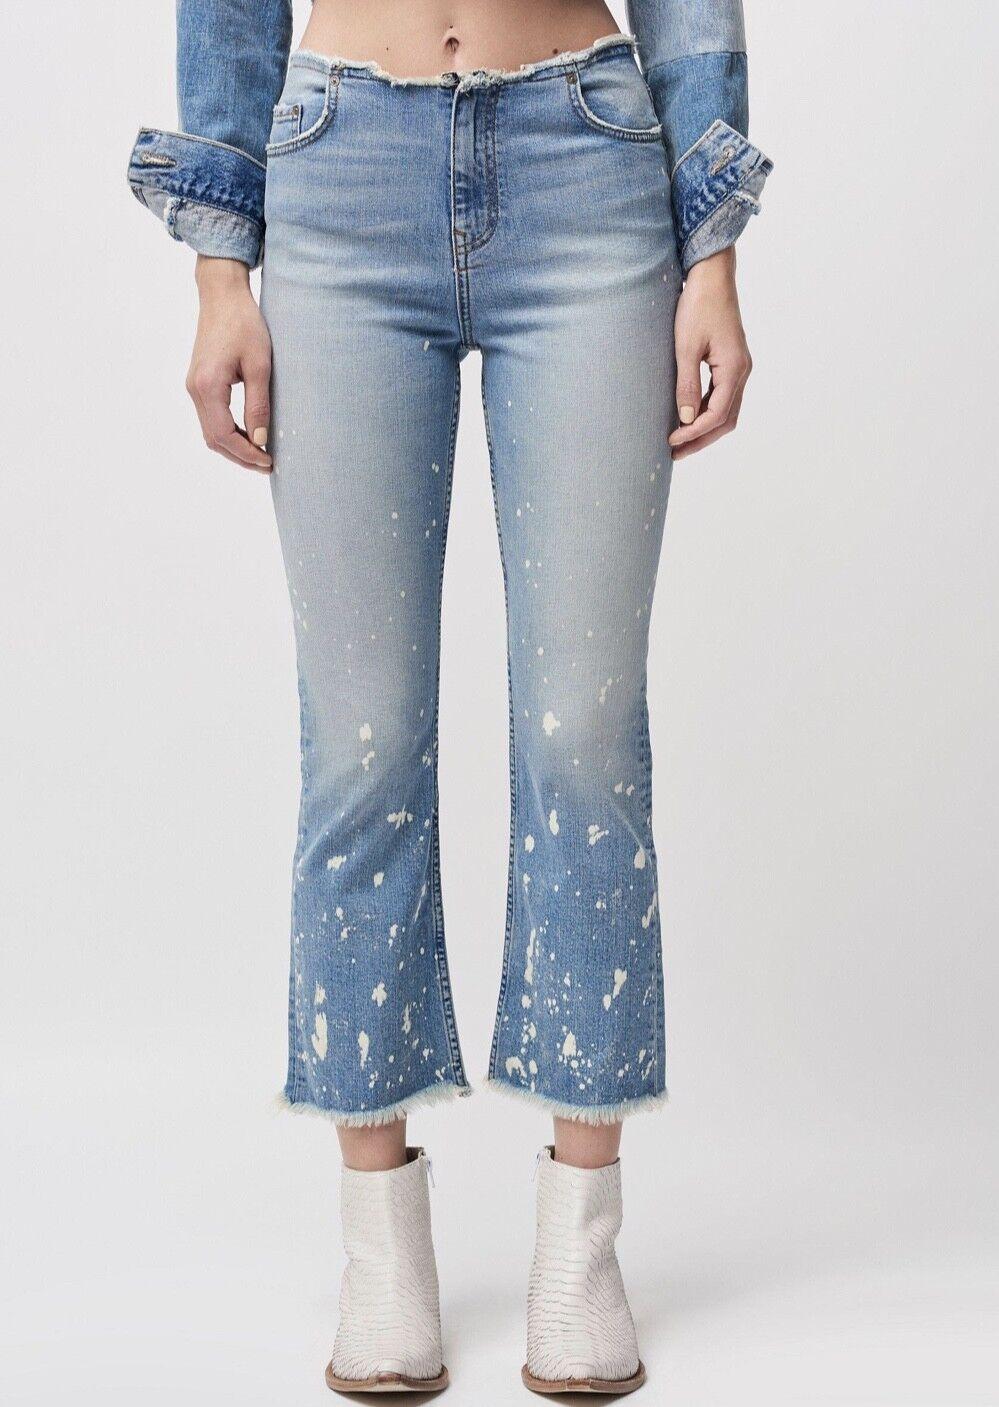 NEW Free People denim Raw Waistband Bleach Spot Mid Rise Crop Bootcut Jeans 28